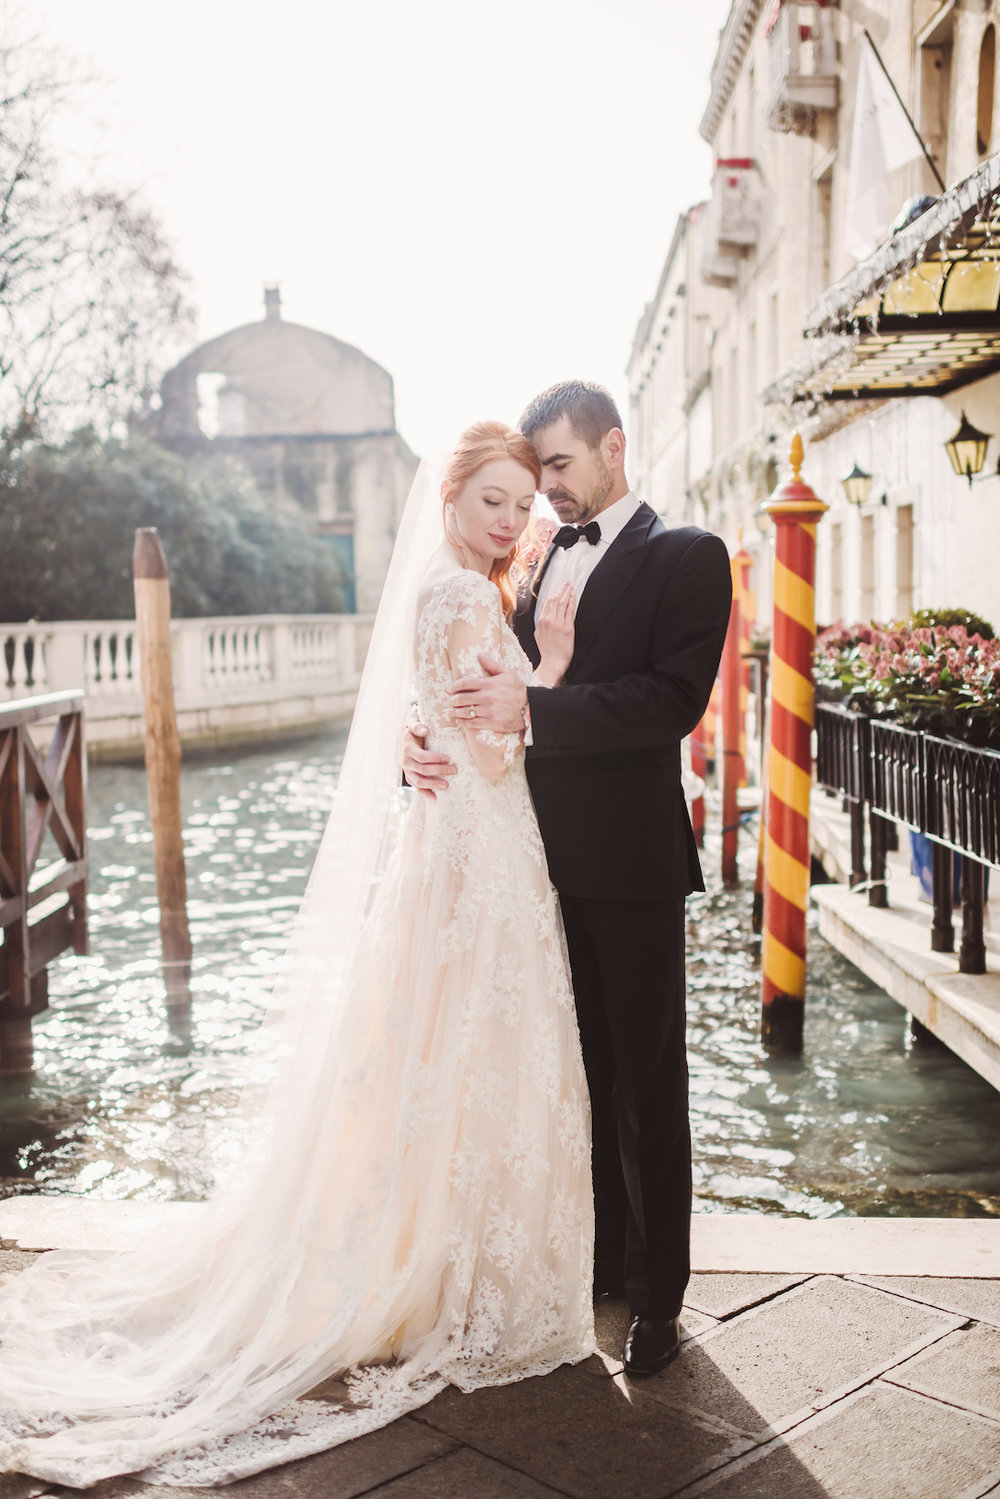 Venice-Wedding-photography-matej-trasak-14.jpg